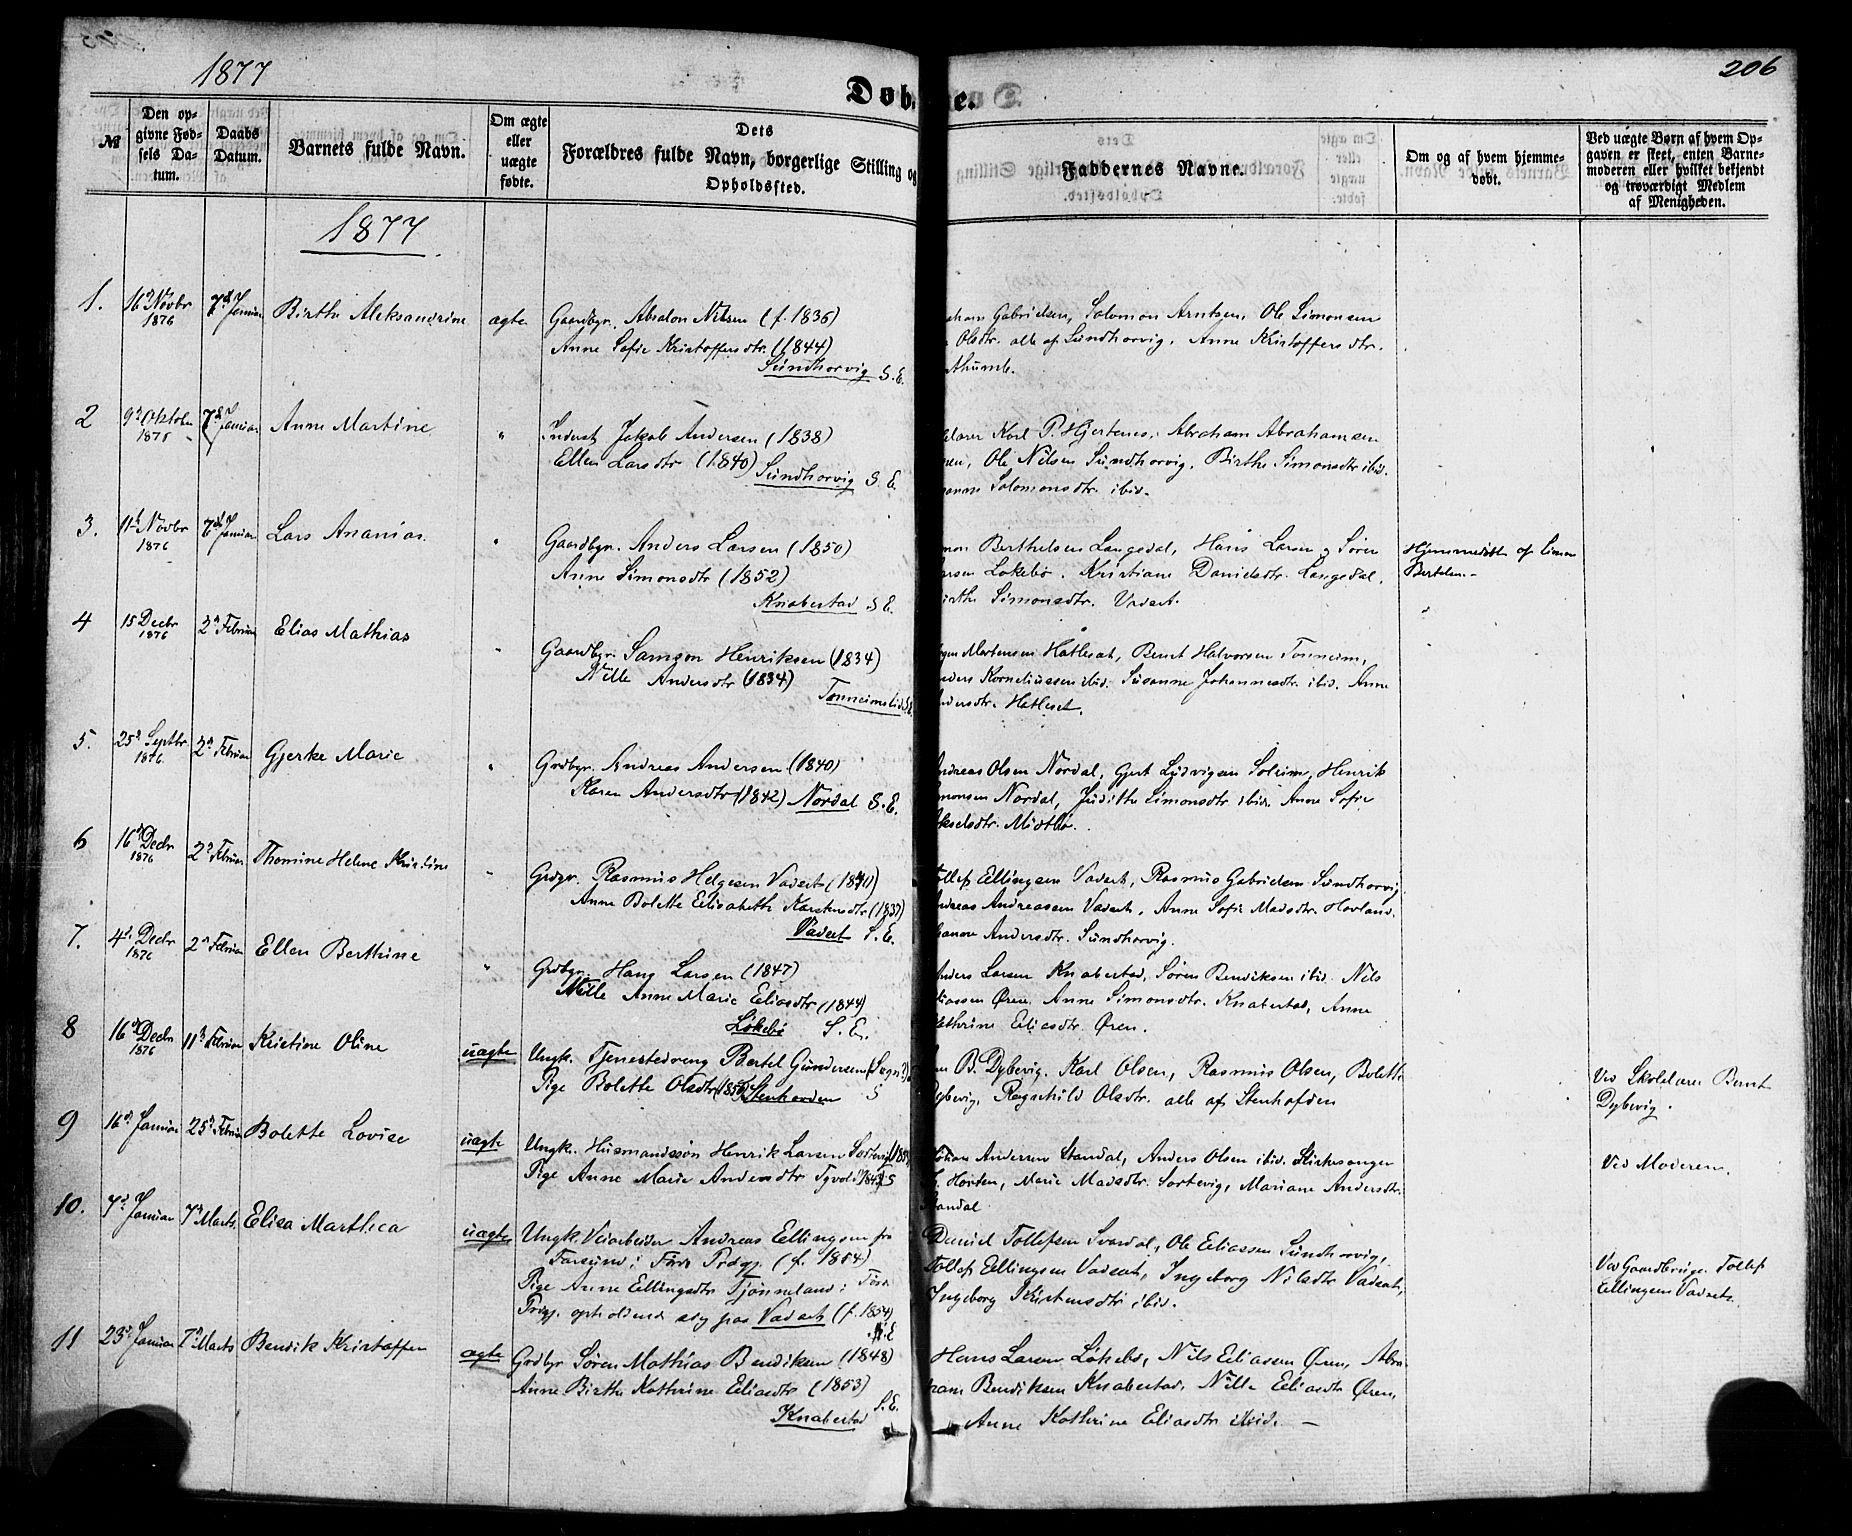 SAB, Kinn sokneprestembete, H/Haa/Haaa/L0006: Parish register (official) no. A 6, 1857-1885, p. 206